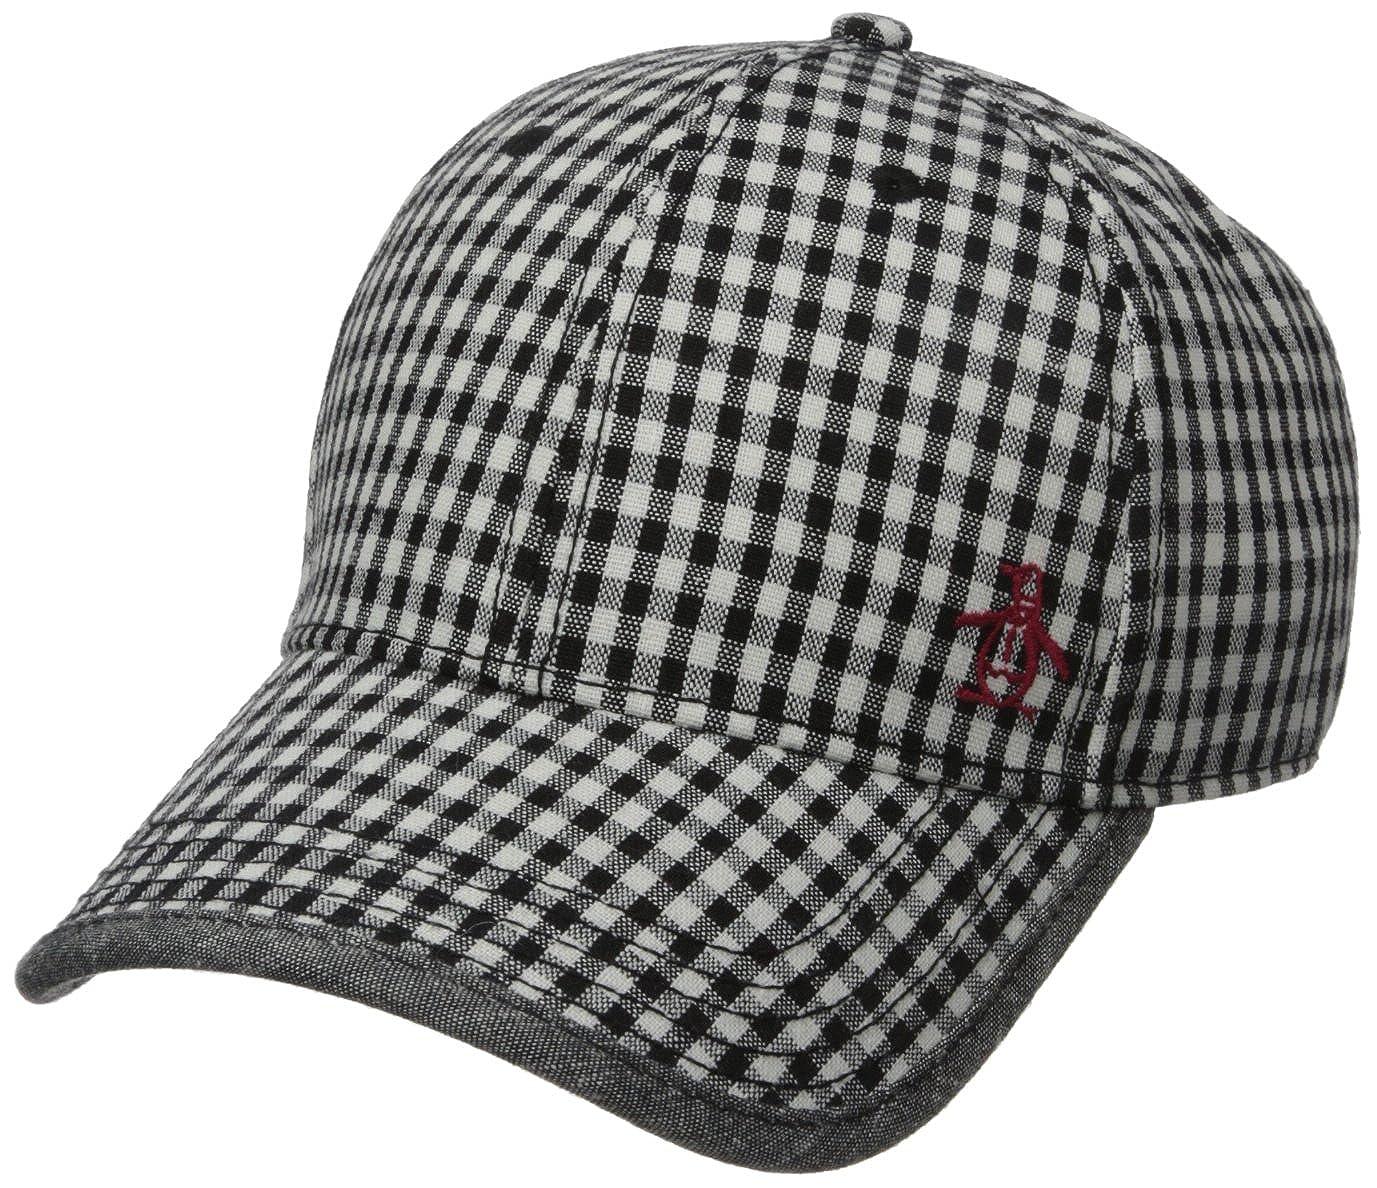 ce1a085ae9a Amazon.com: Original Penguin Men's Gingham Baseball Cap, Black One Size:  Clothing